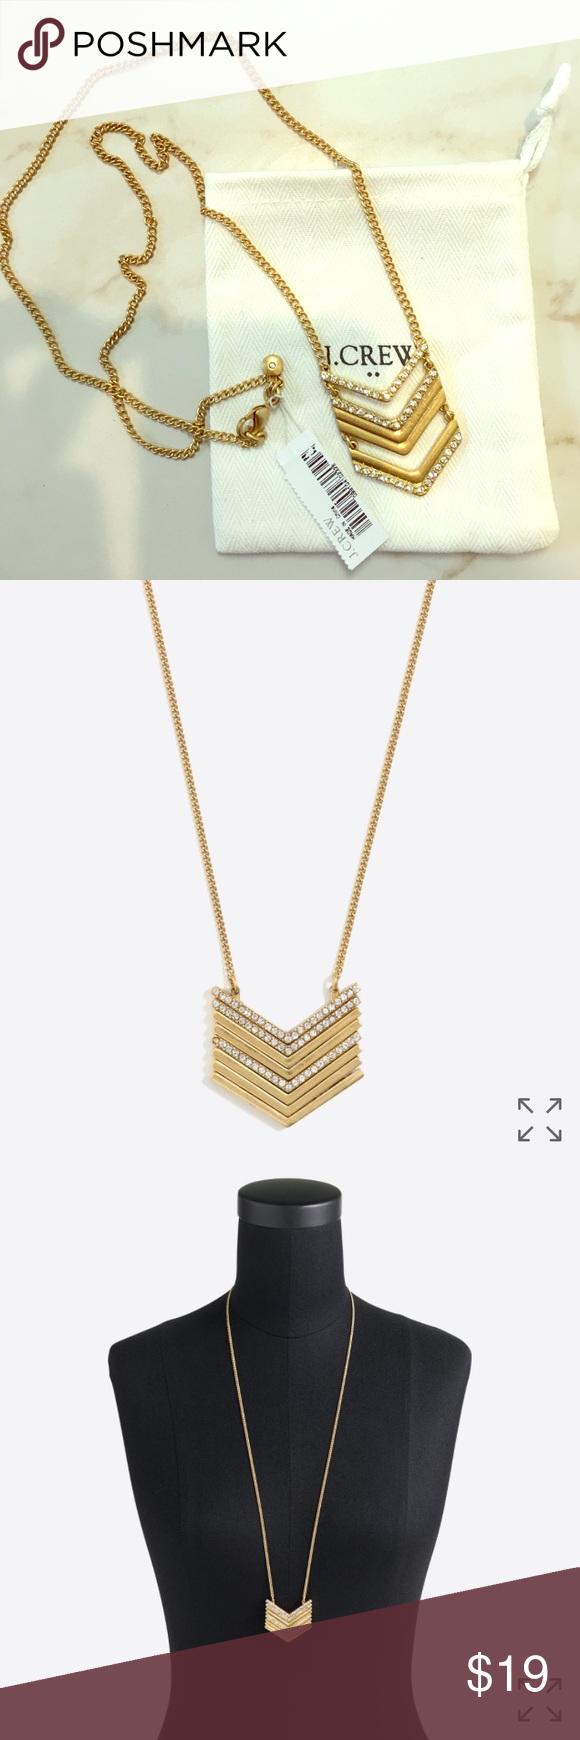 Nwt j crew chevron pendant necklace pendants customer support and